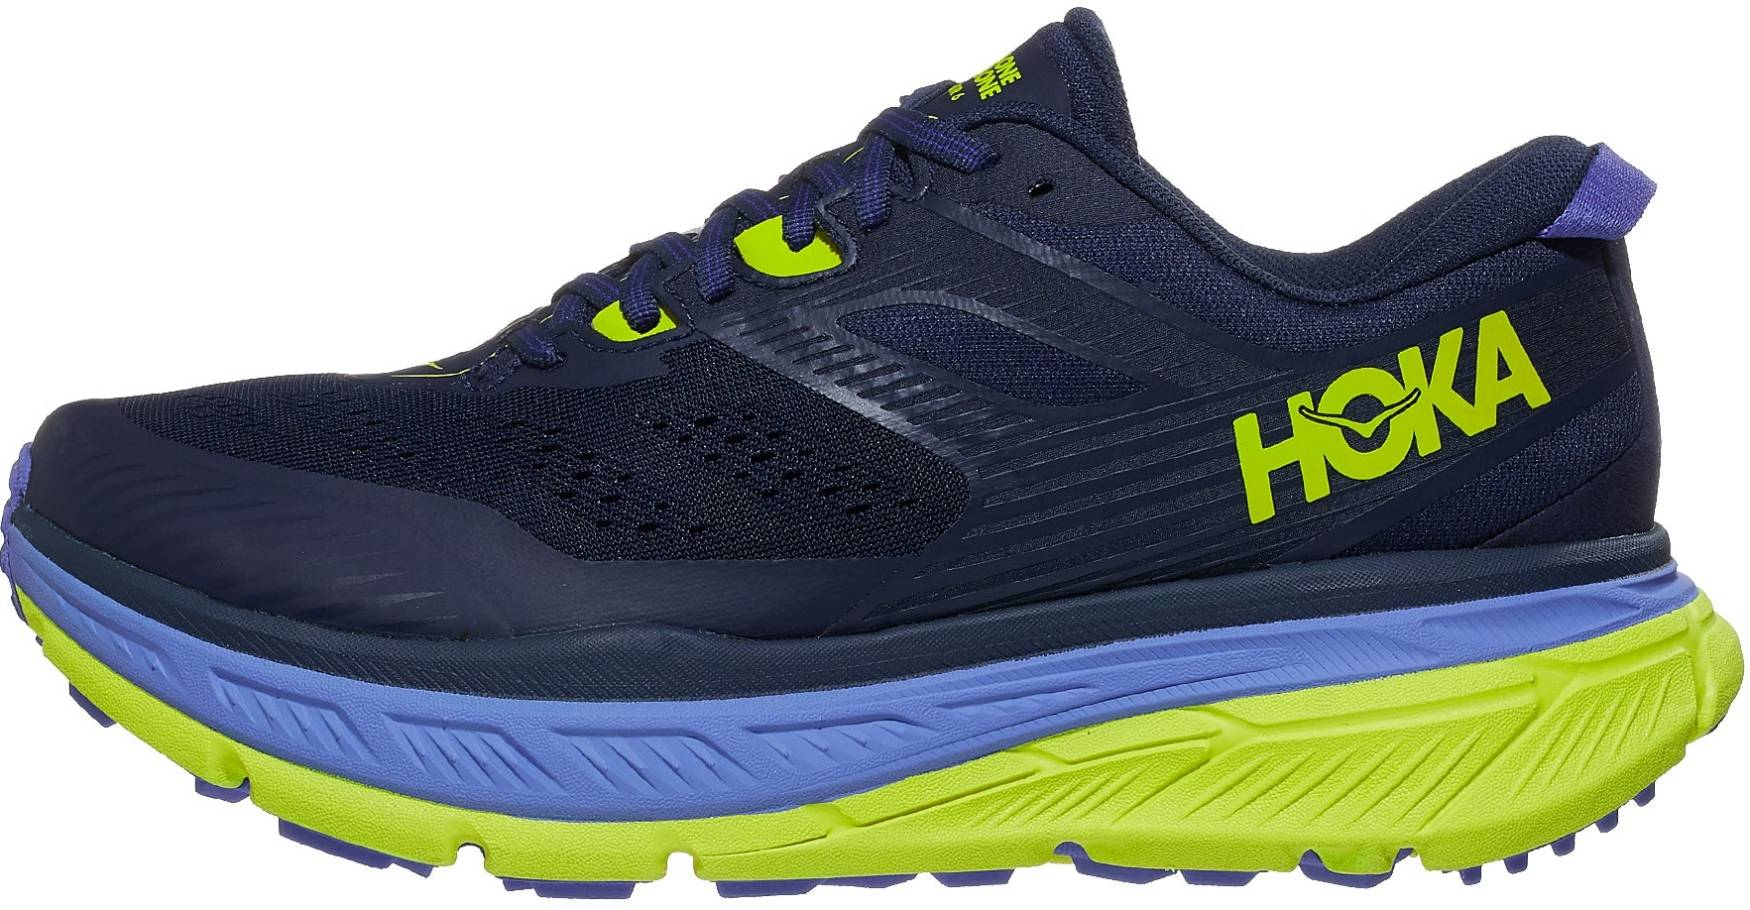 Save 35% on Hoka One One Running Shoes